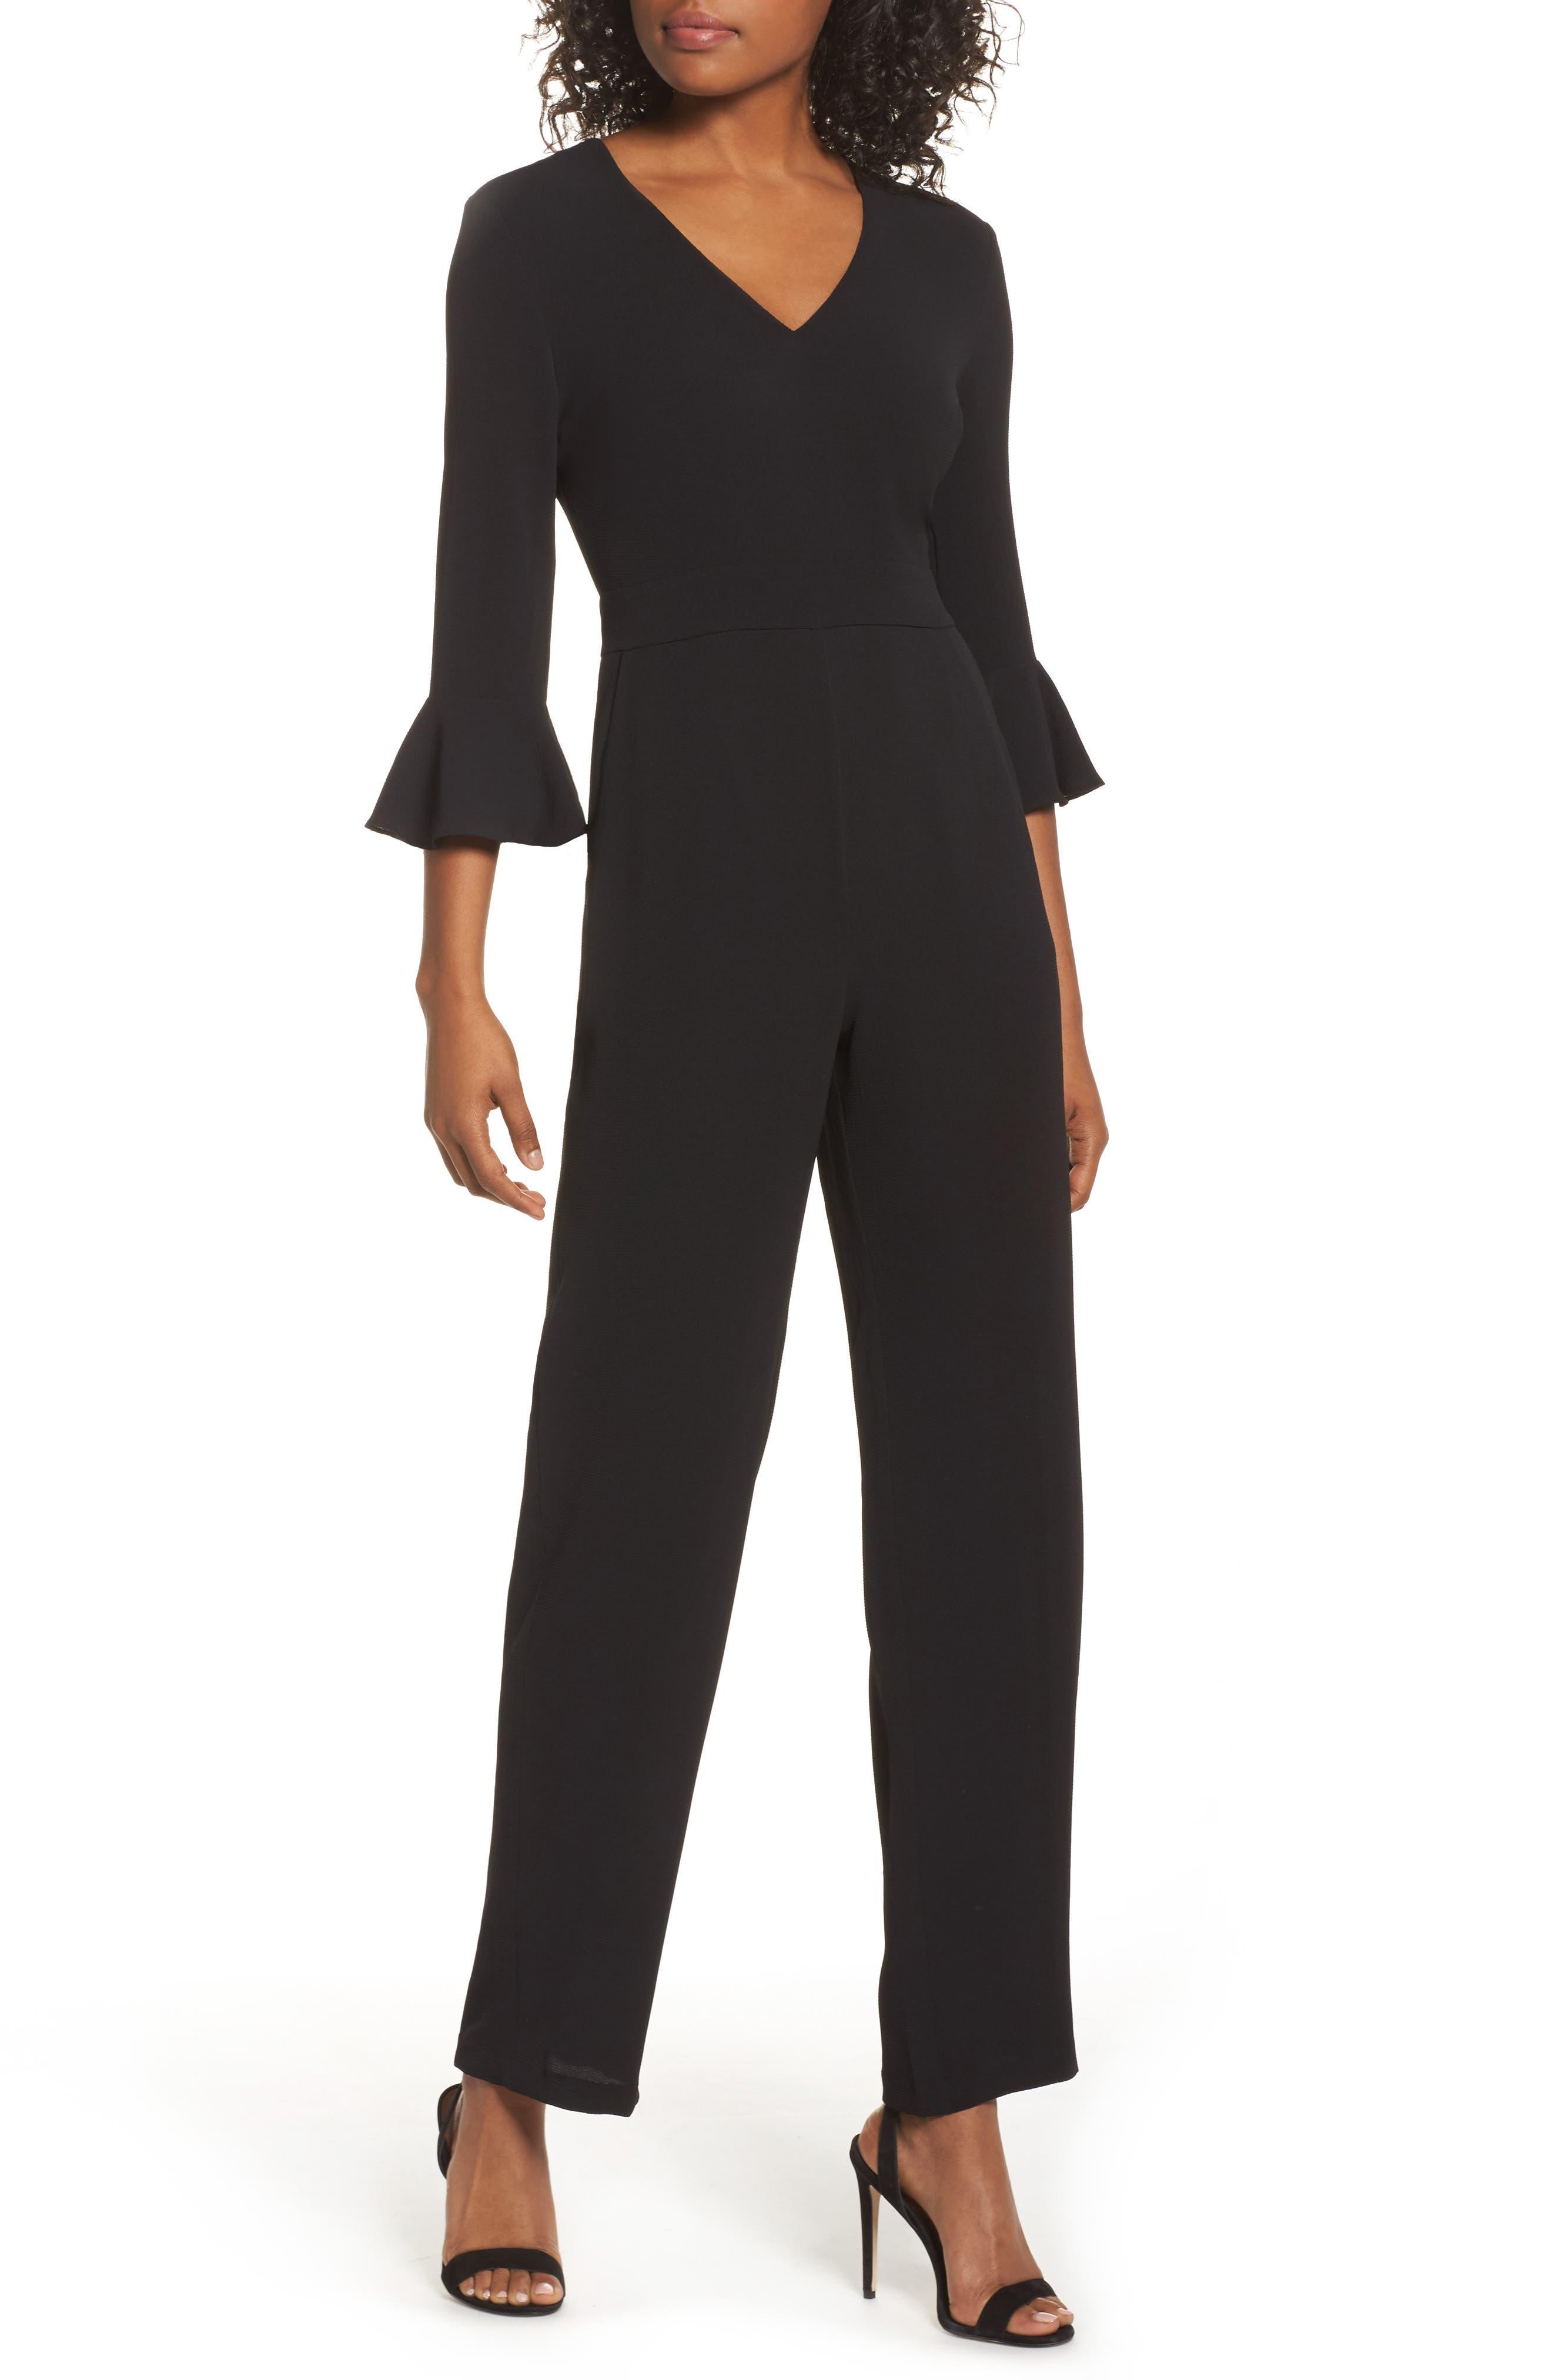 Alternate Image 1 Selected - Charles Henry Flare Cuff Jumpsuit (Regular & Petite)